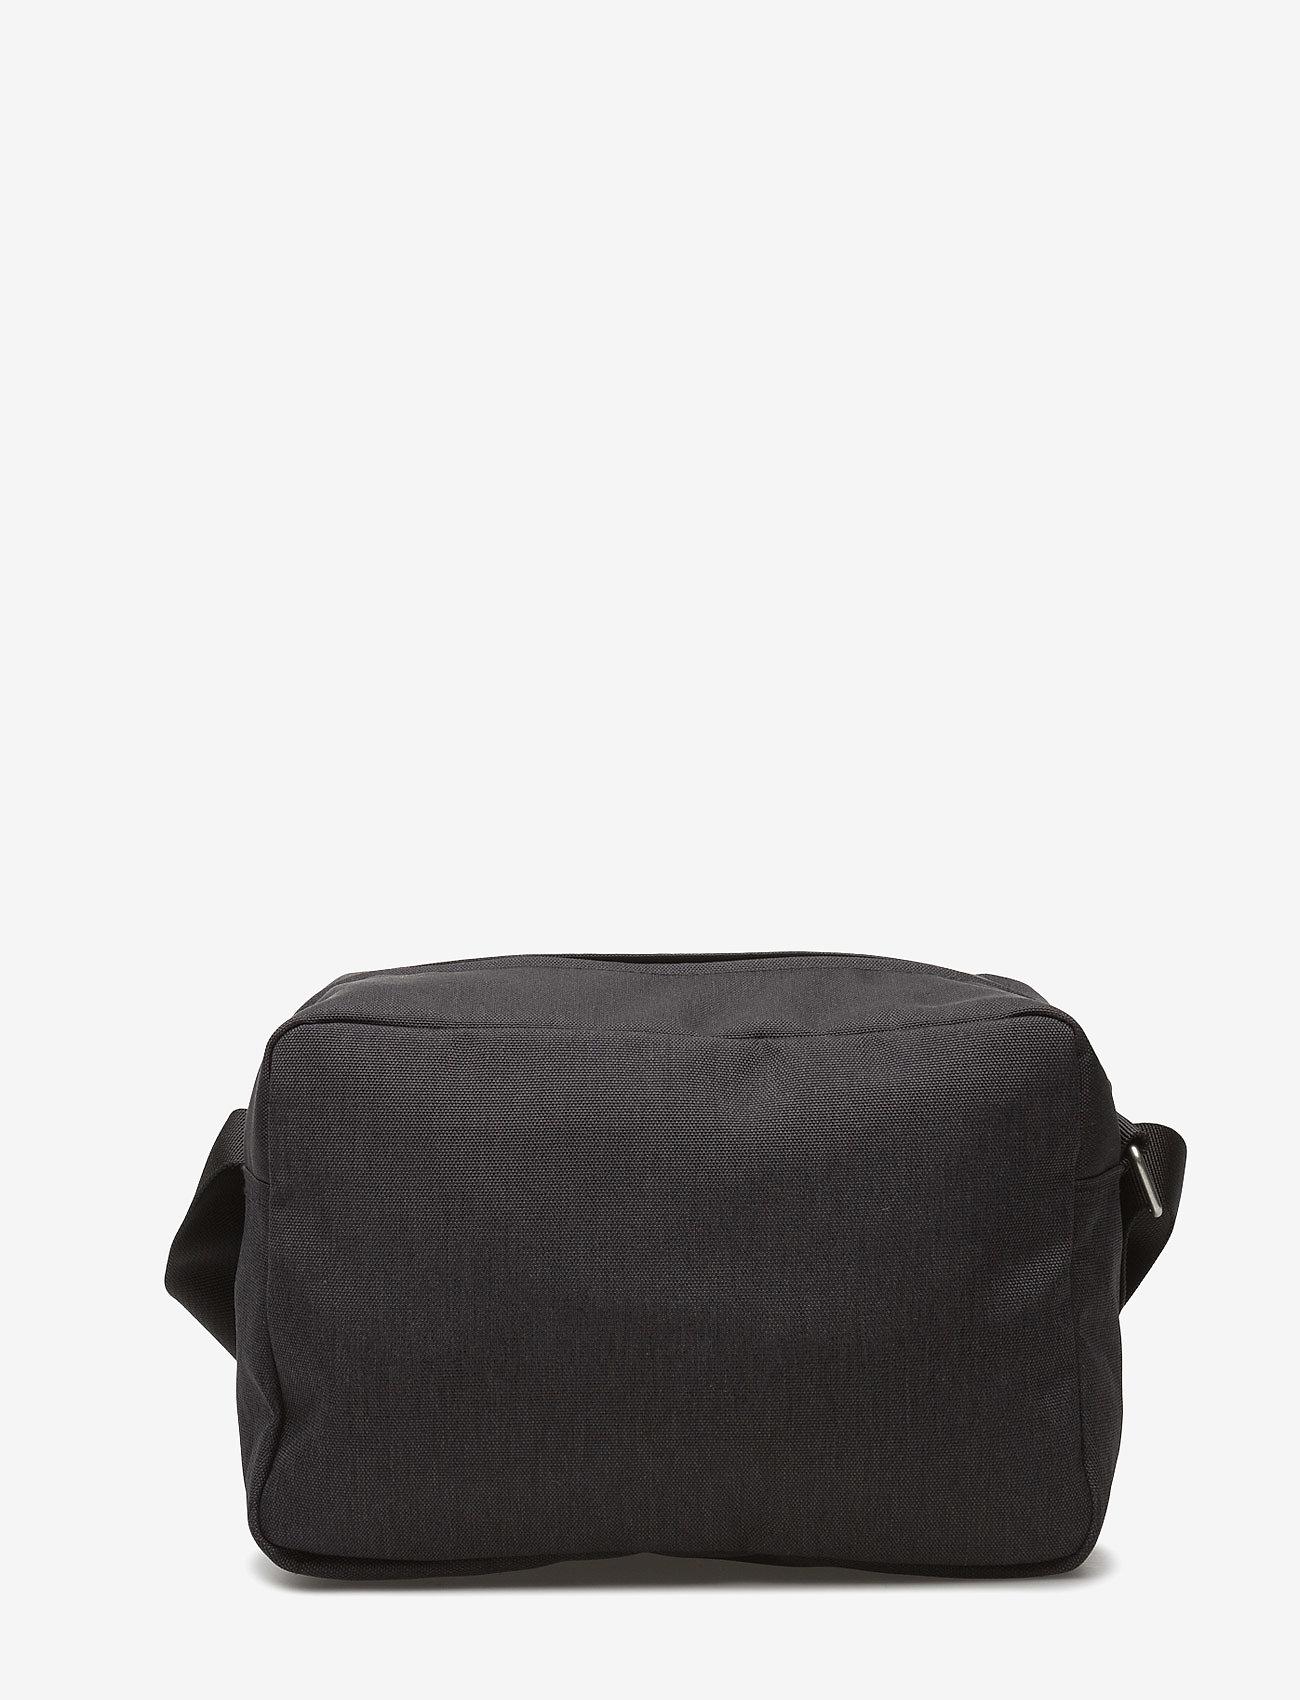 Marimekko - KORTTELI SHOULDER BAG - crossbody bags - black - 1